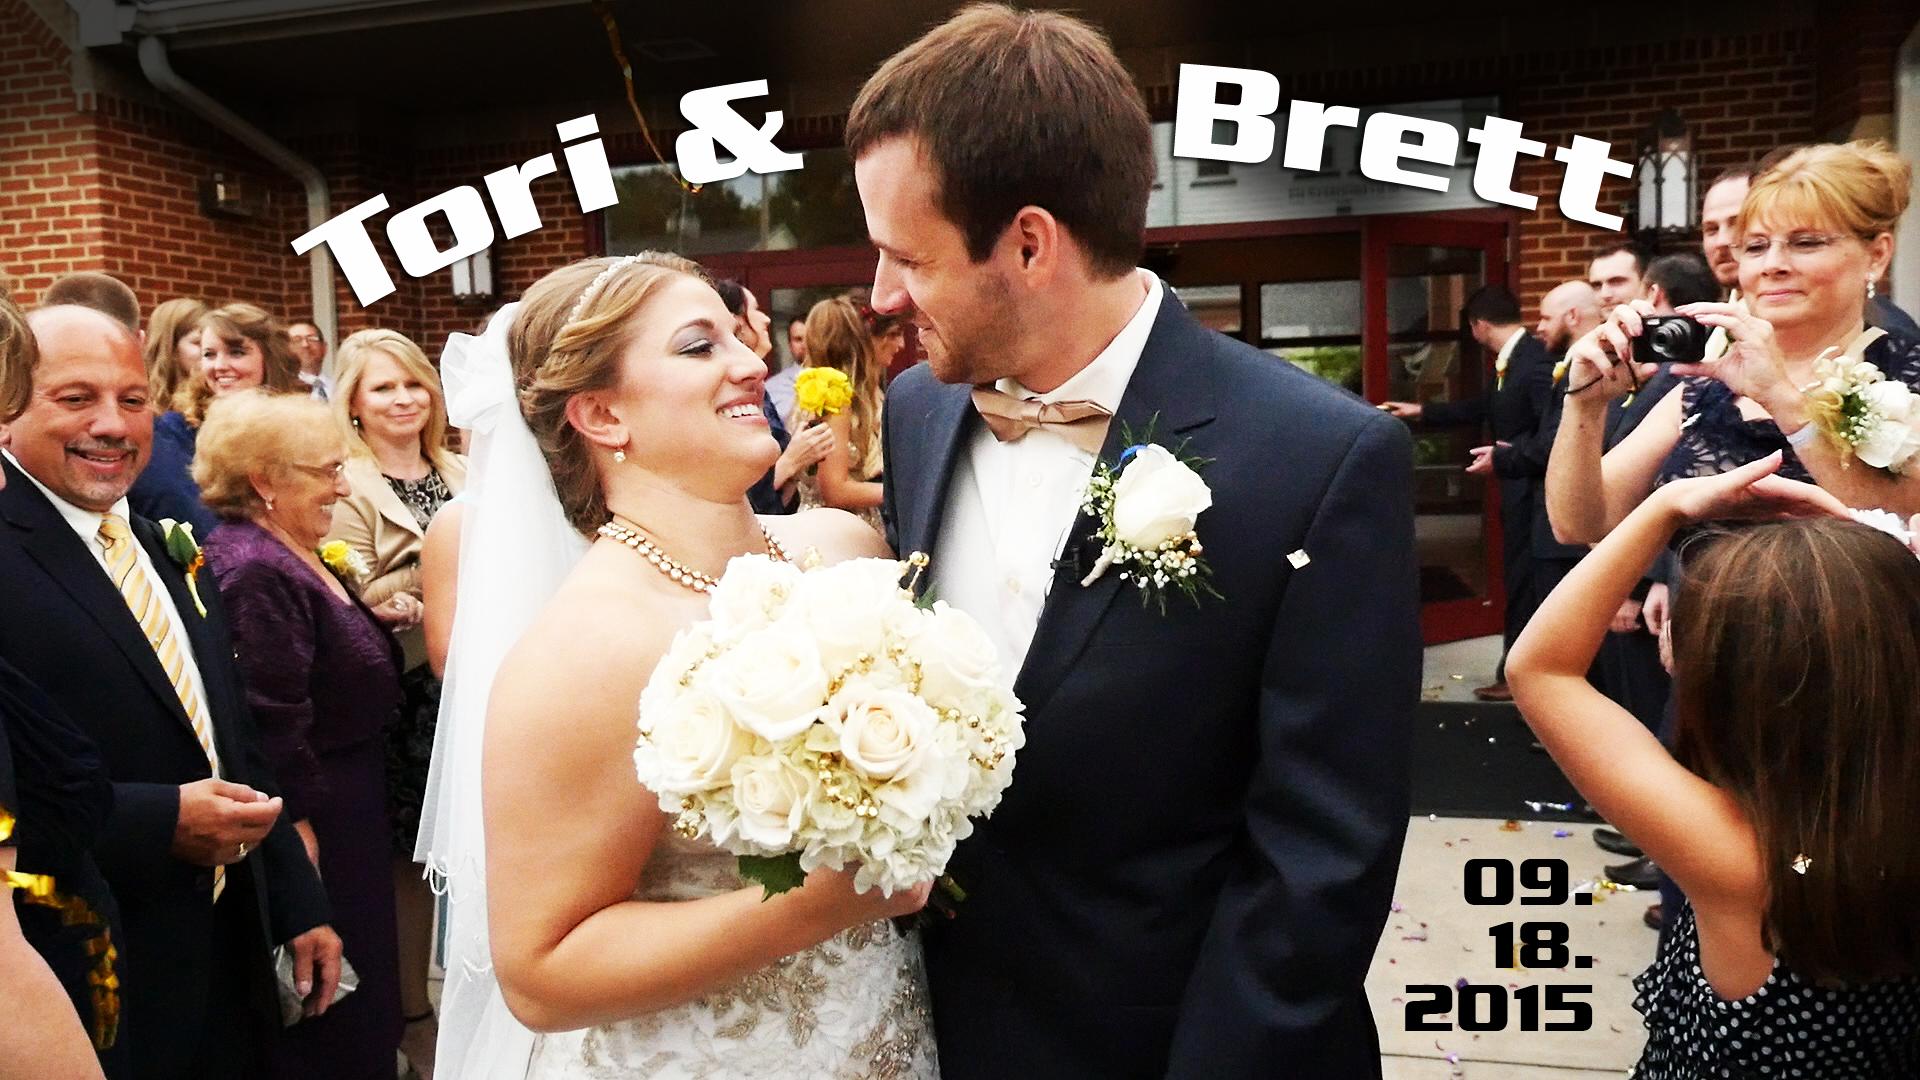 Brett & Tori – Greenville, PA Wedding Video